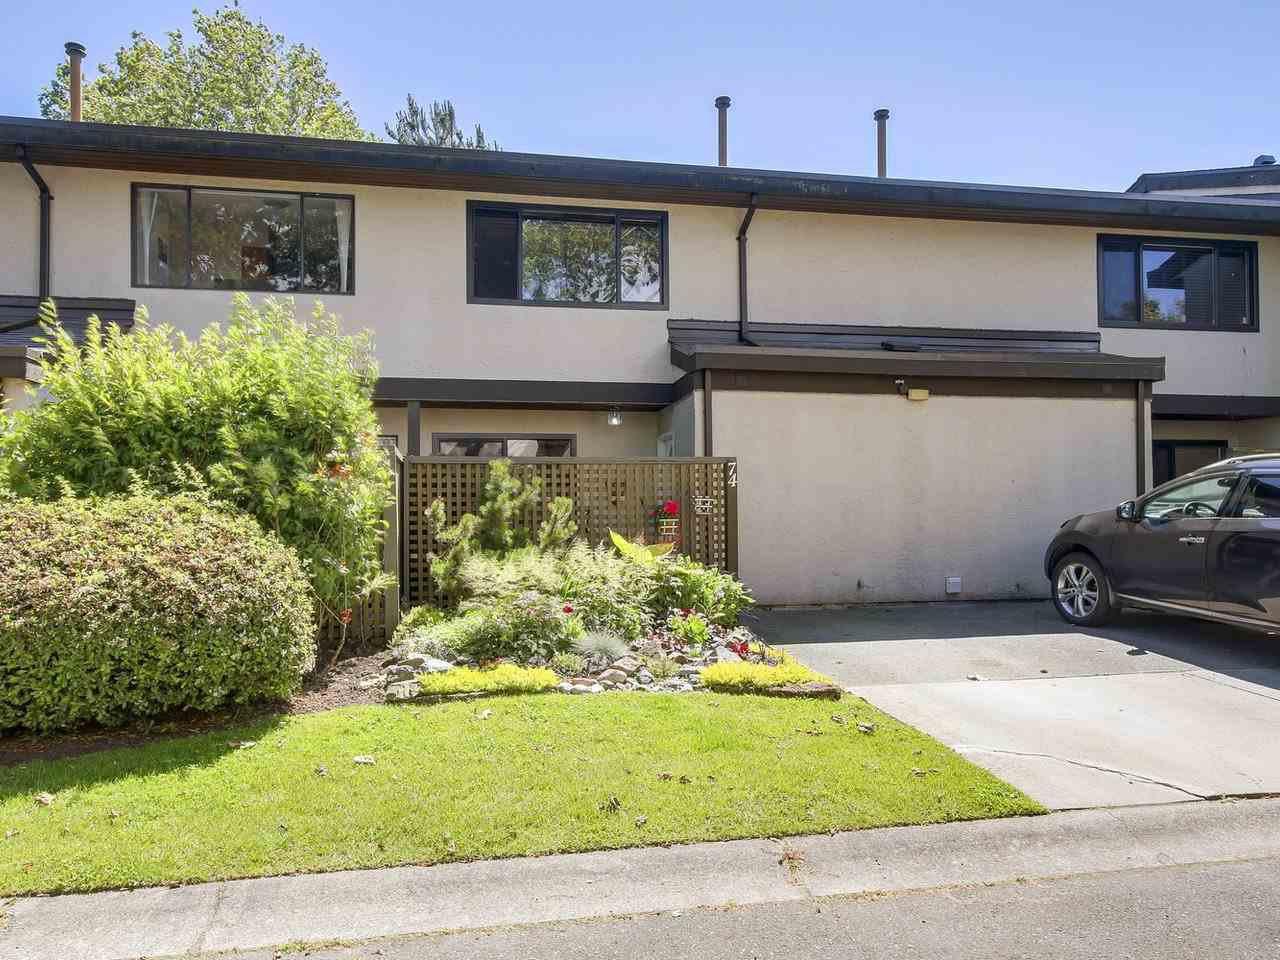 Main Photo: 74 11491 7TH AVENUE in : Steveston Village Townhouse for sale : MLS®# R2178699